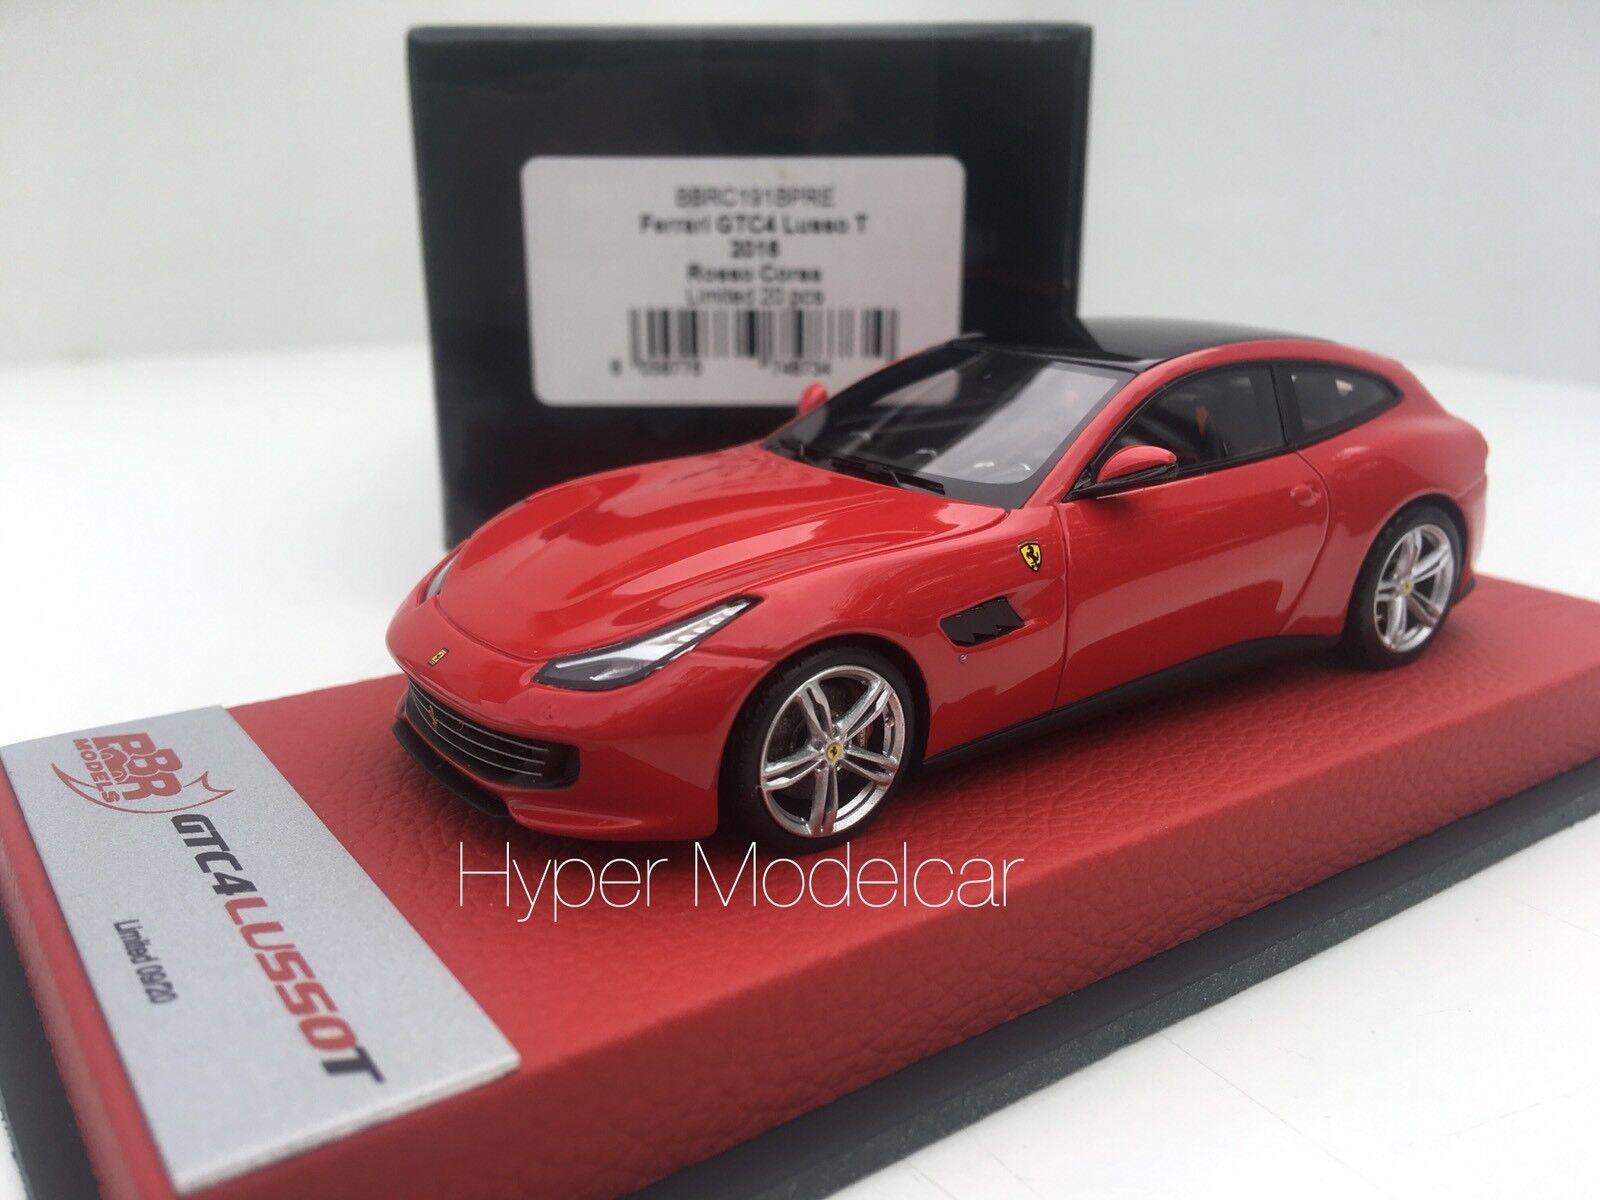 BBR Models 1 43 Ferrari gtc4 Luxury T 2017 Red Leather Base Art BBRC 191pre